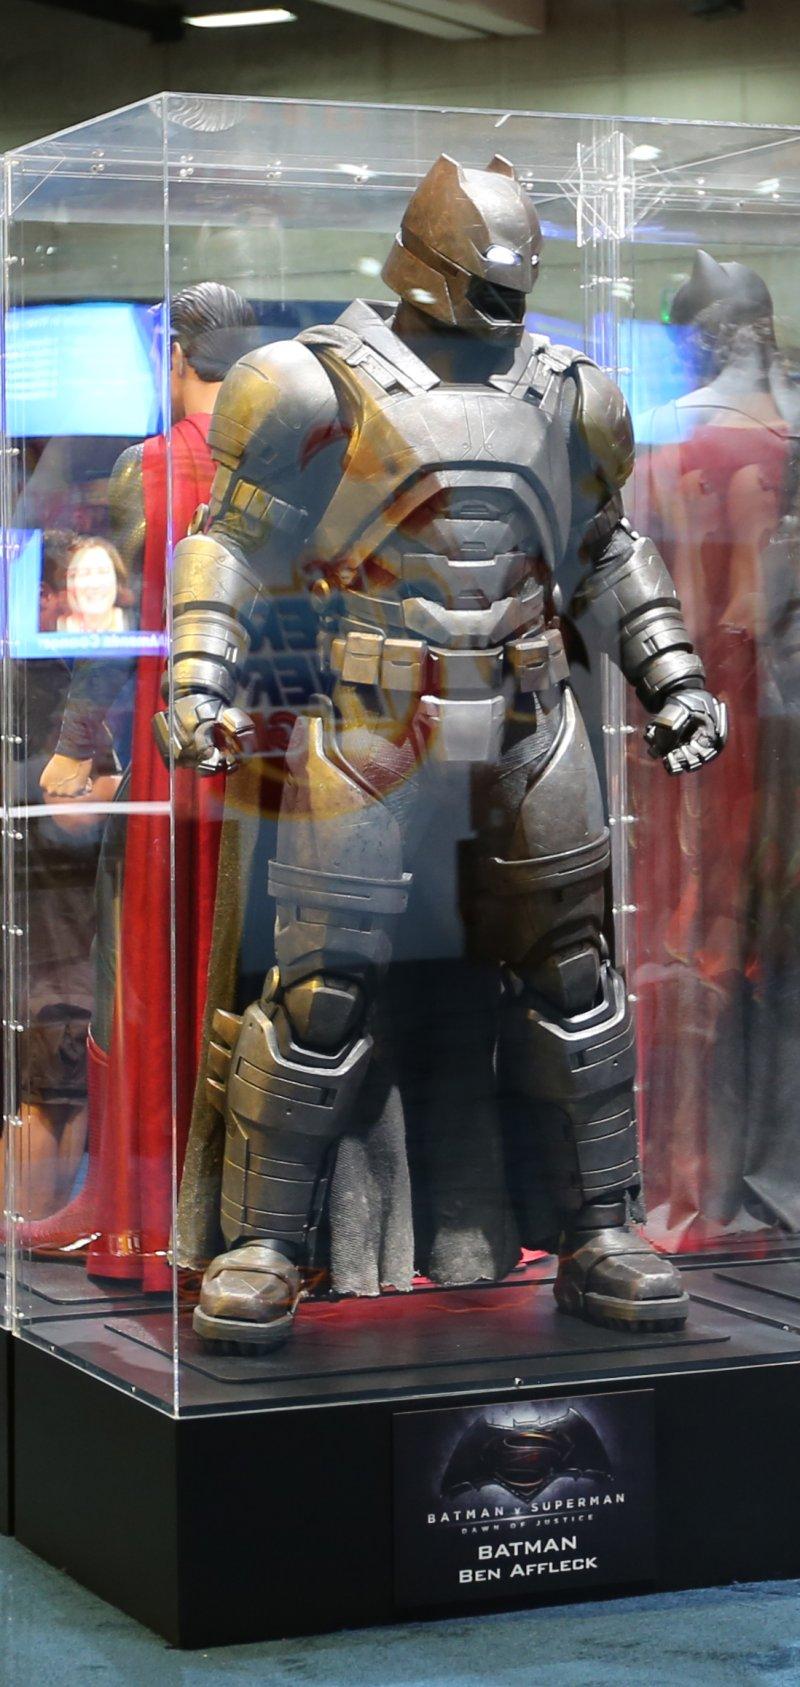 Ben Affleck's armored Batsuit in 'Batman v Superman' is ...